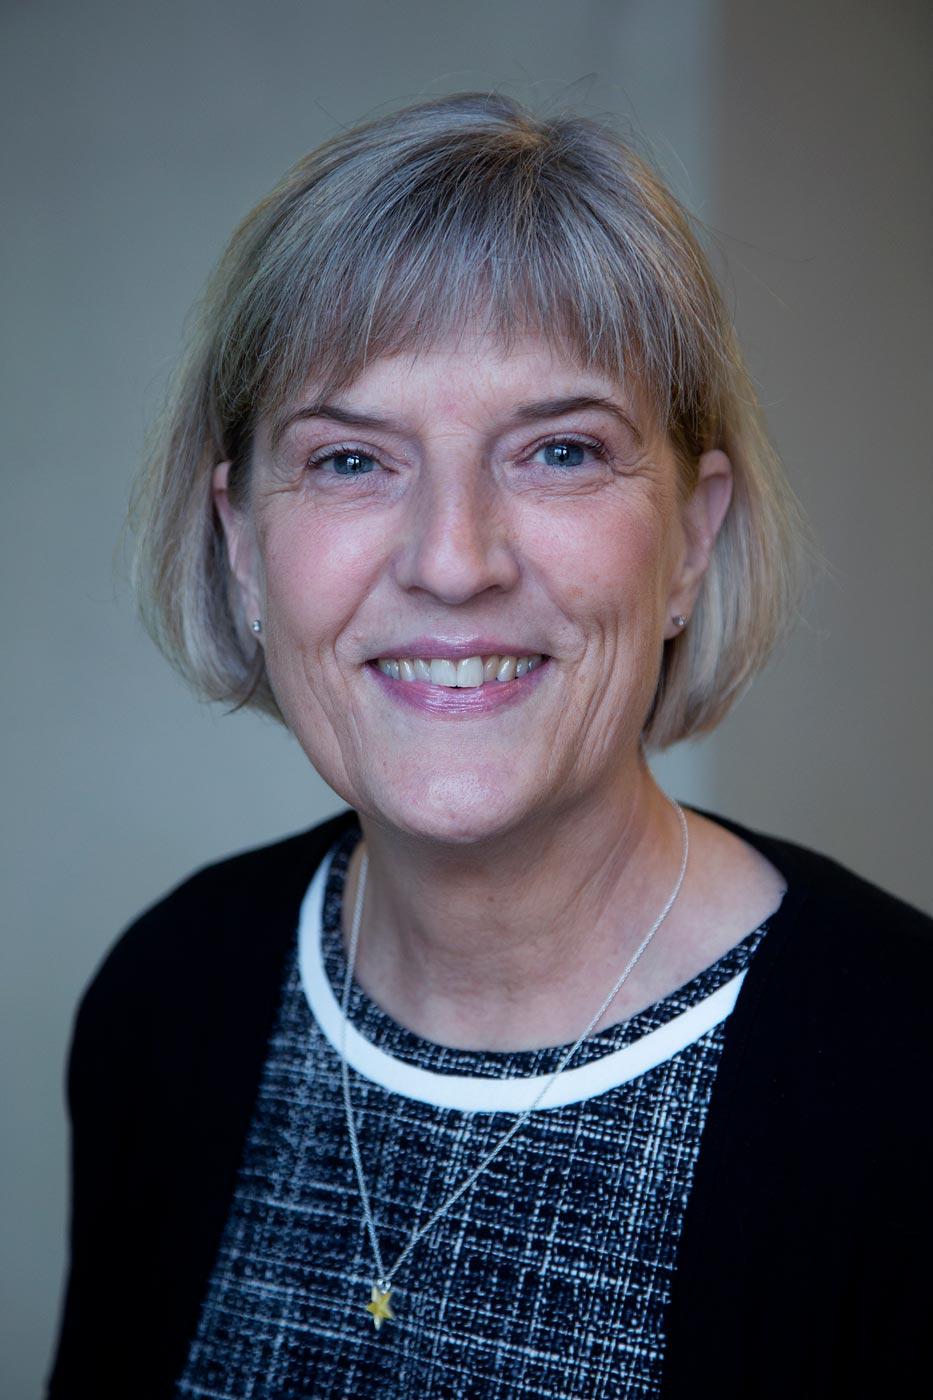 Camilla Bruno Dunsæd